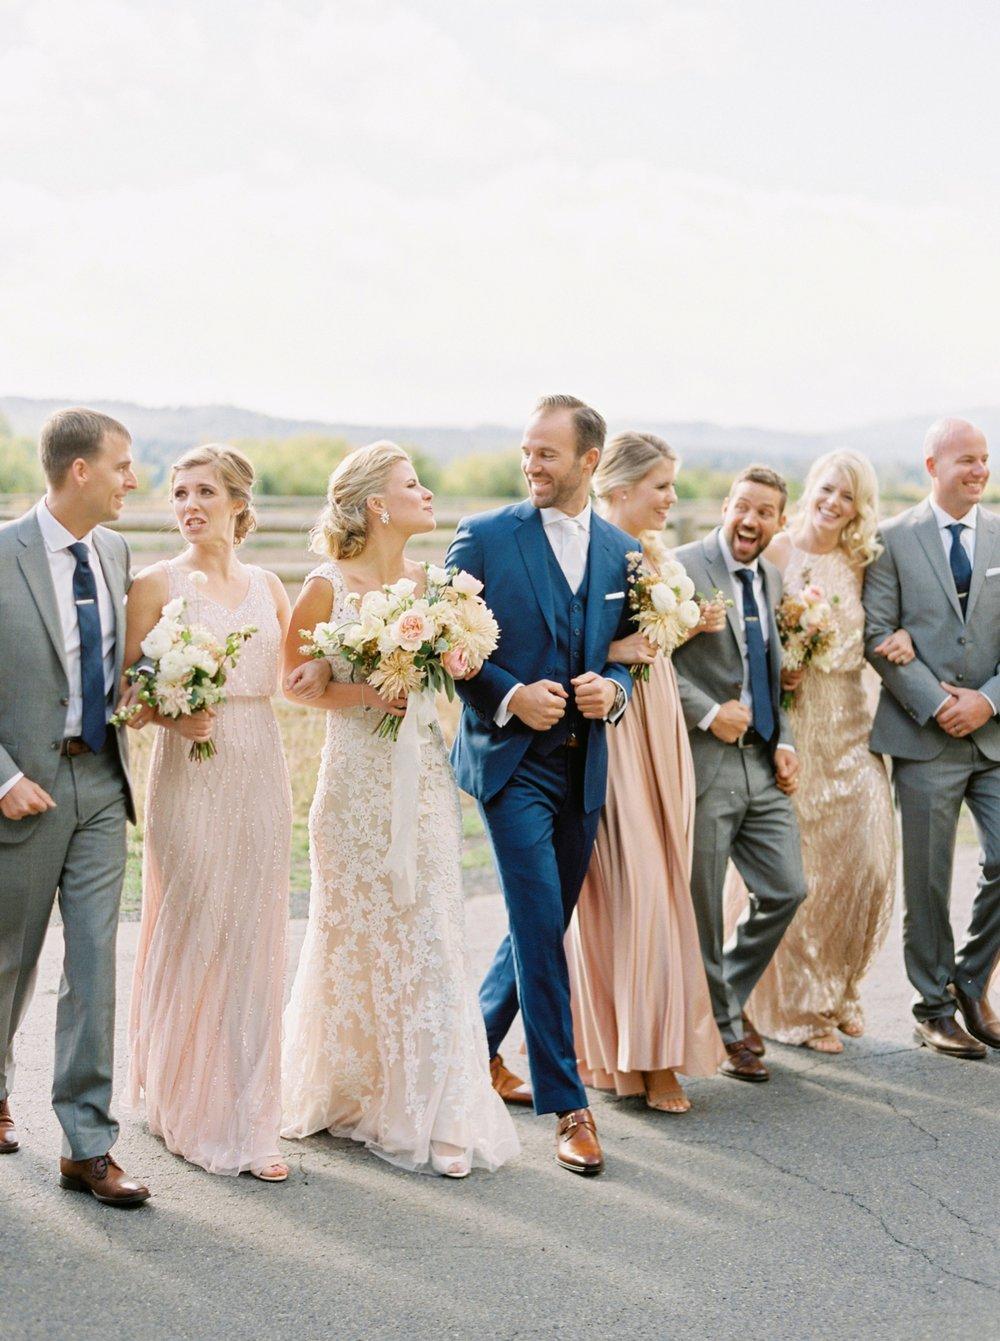 Calgary wedding photographers | oregon wedding photographers | fine art film | Justine Milton Photography | oregon wedding | bride and groom portraits | wedding party